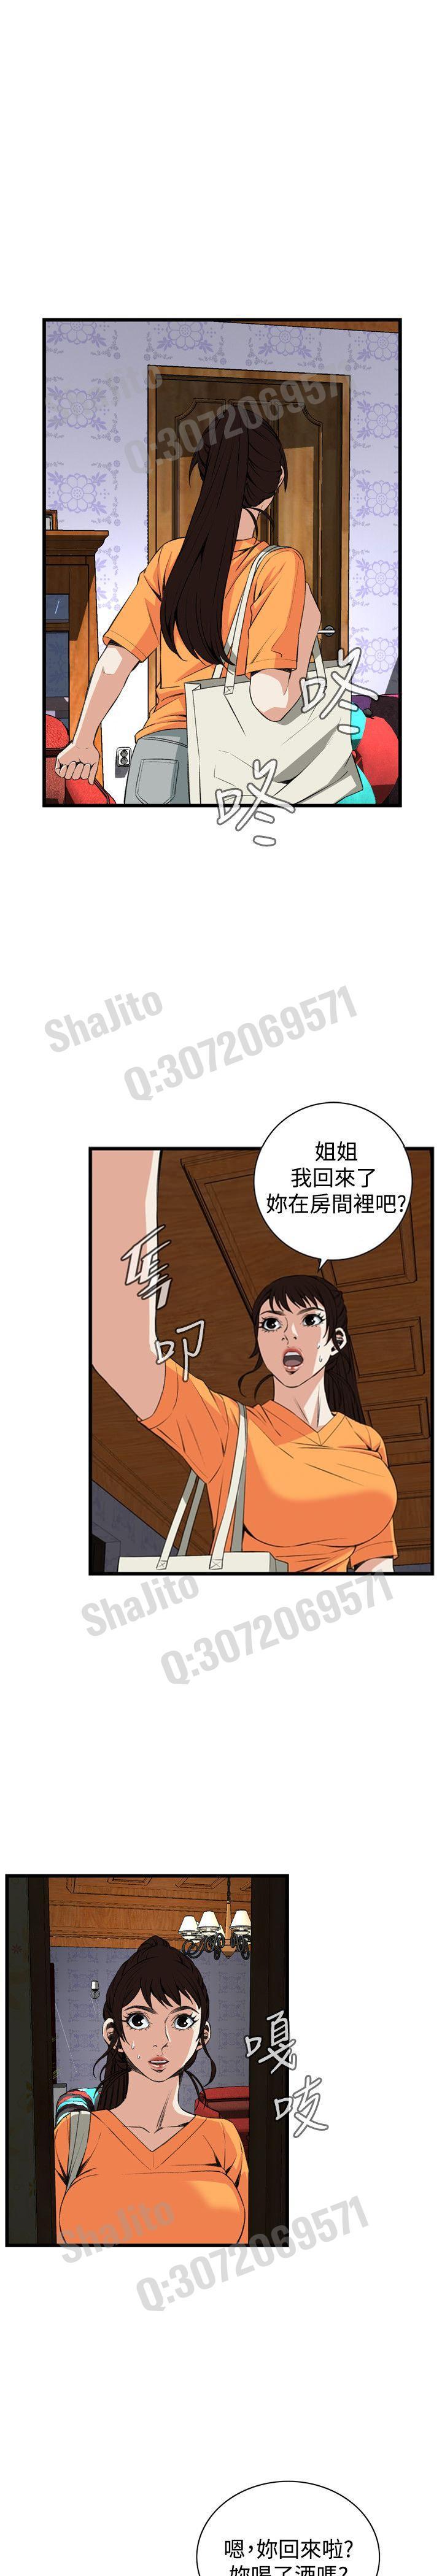 Take a peek 偷窥67-69 Chinese 44